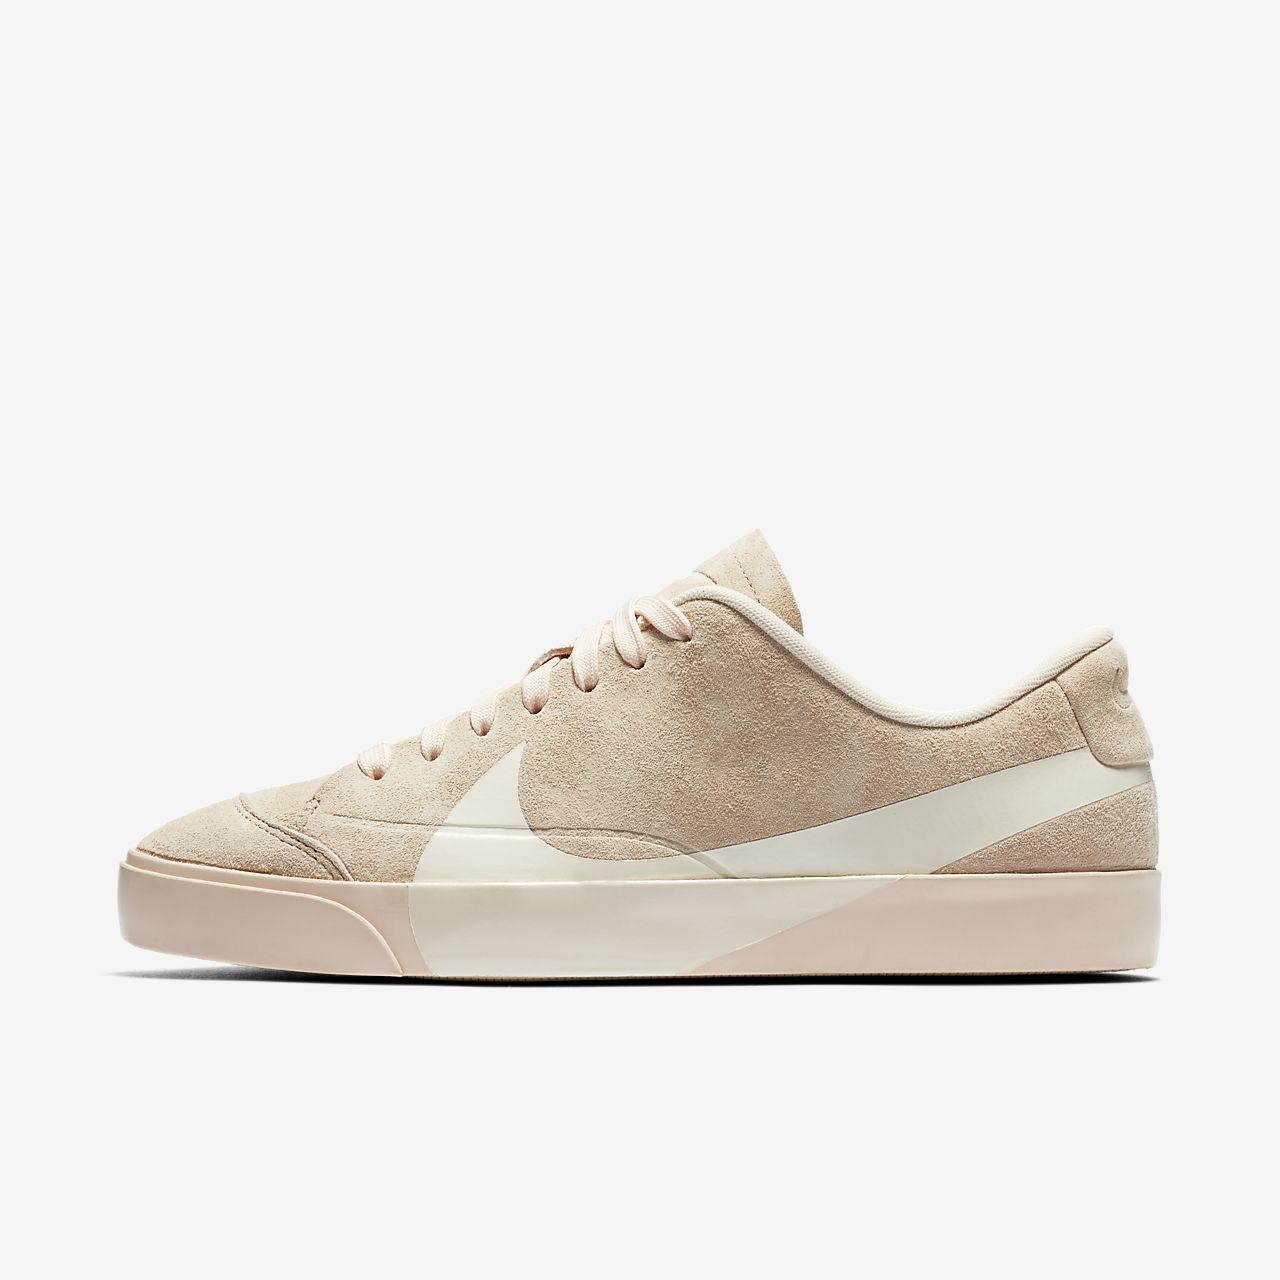 pretty nice 109fc 4720a Chaussure Nike Blazer City Low LX pour Femme